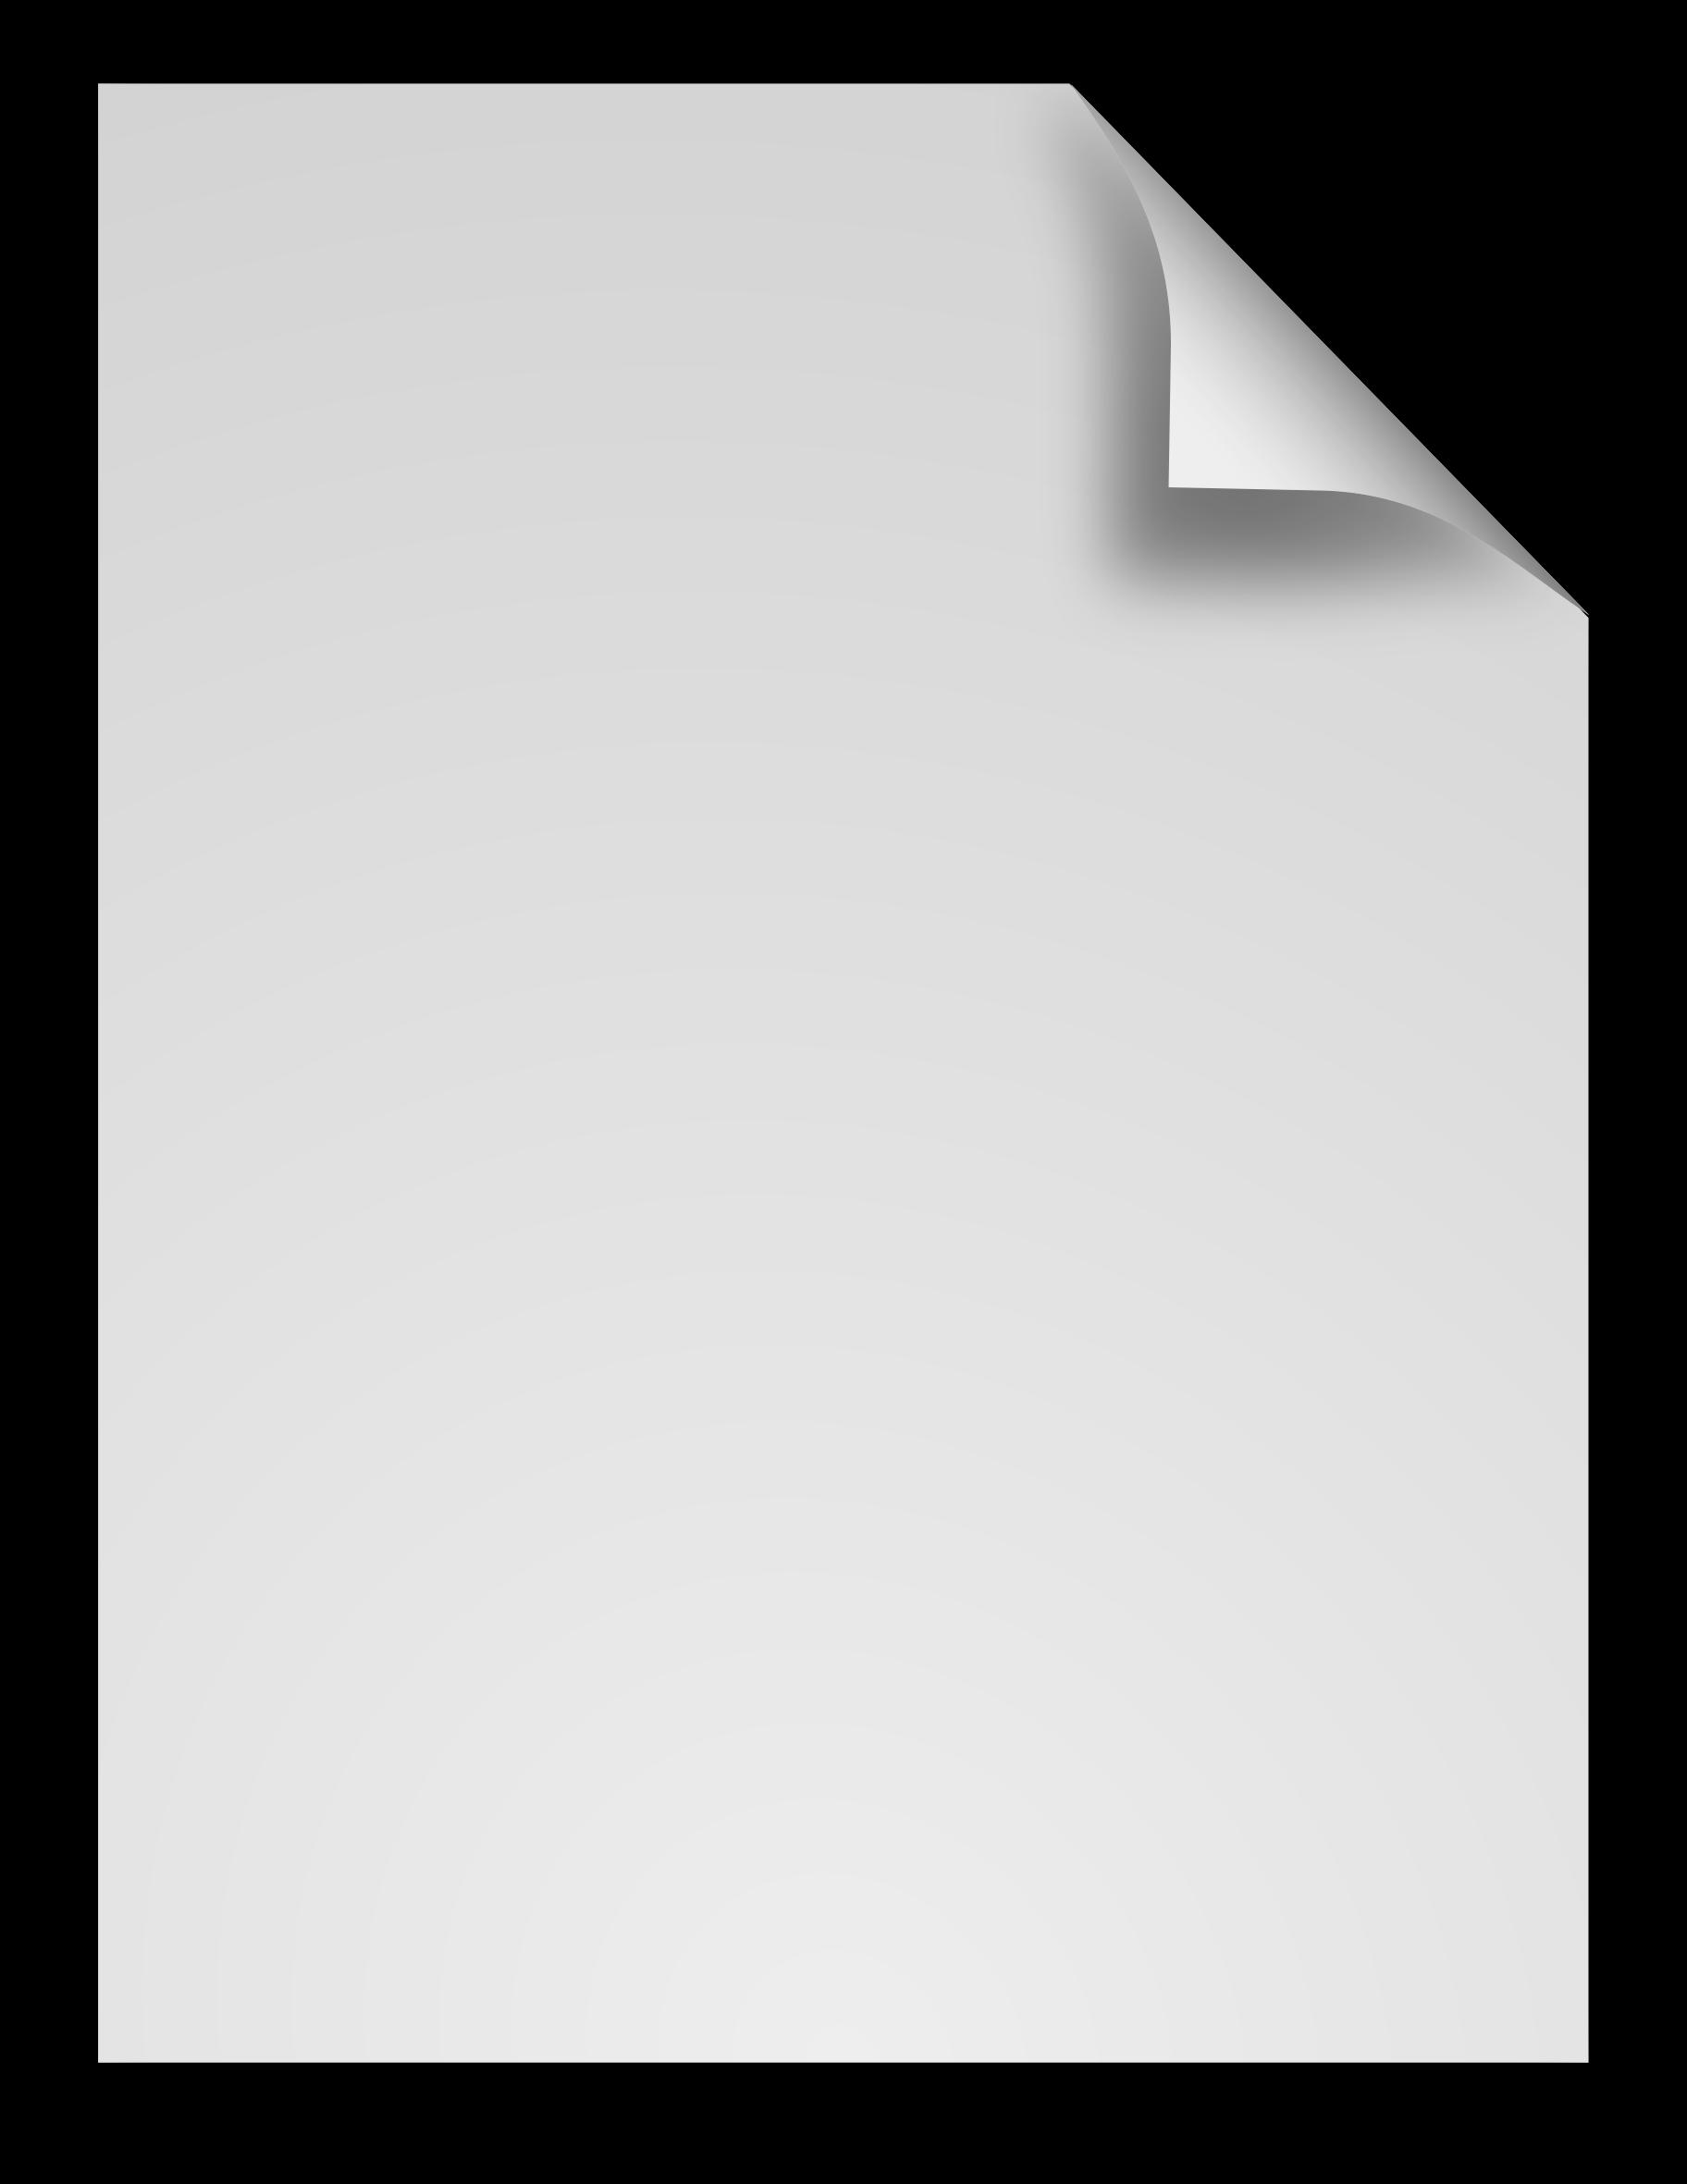 clipart generic file icon